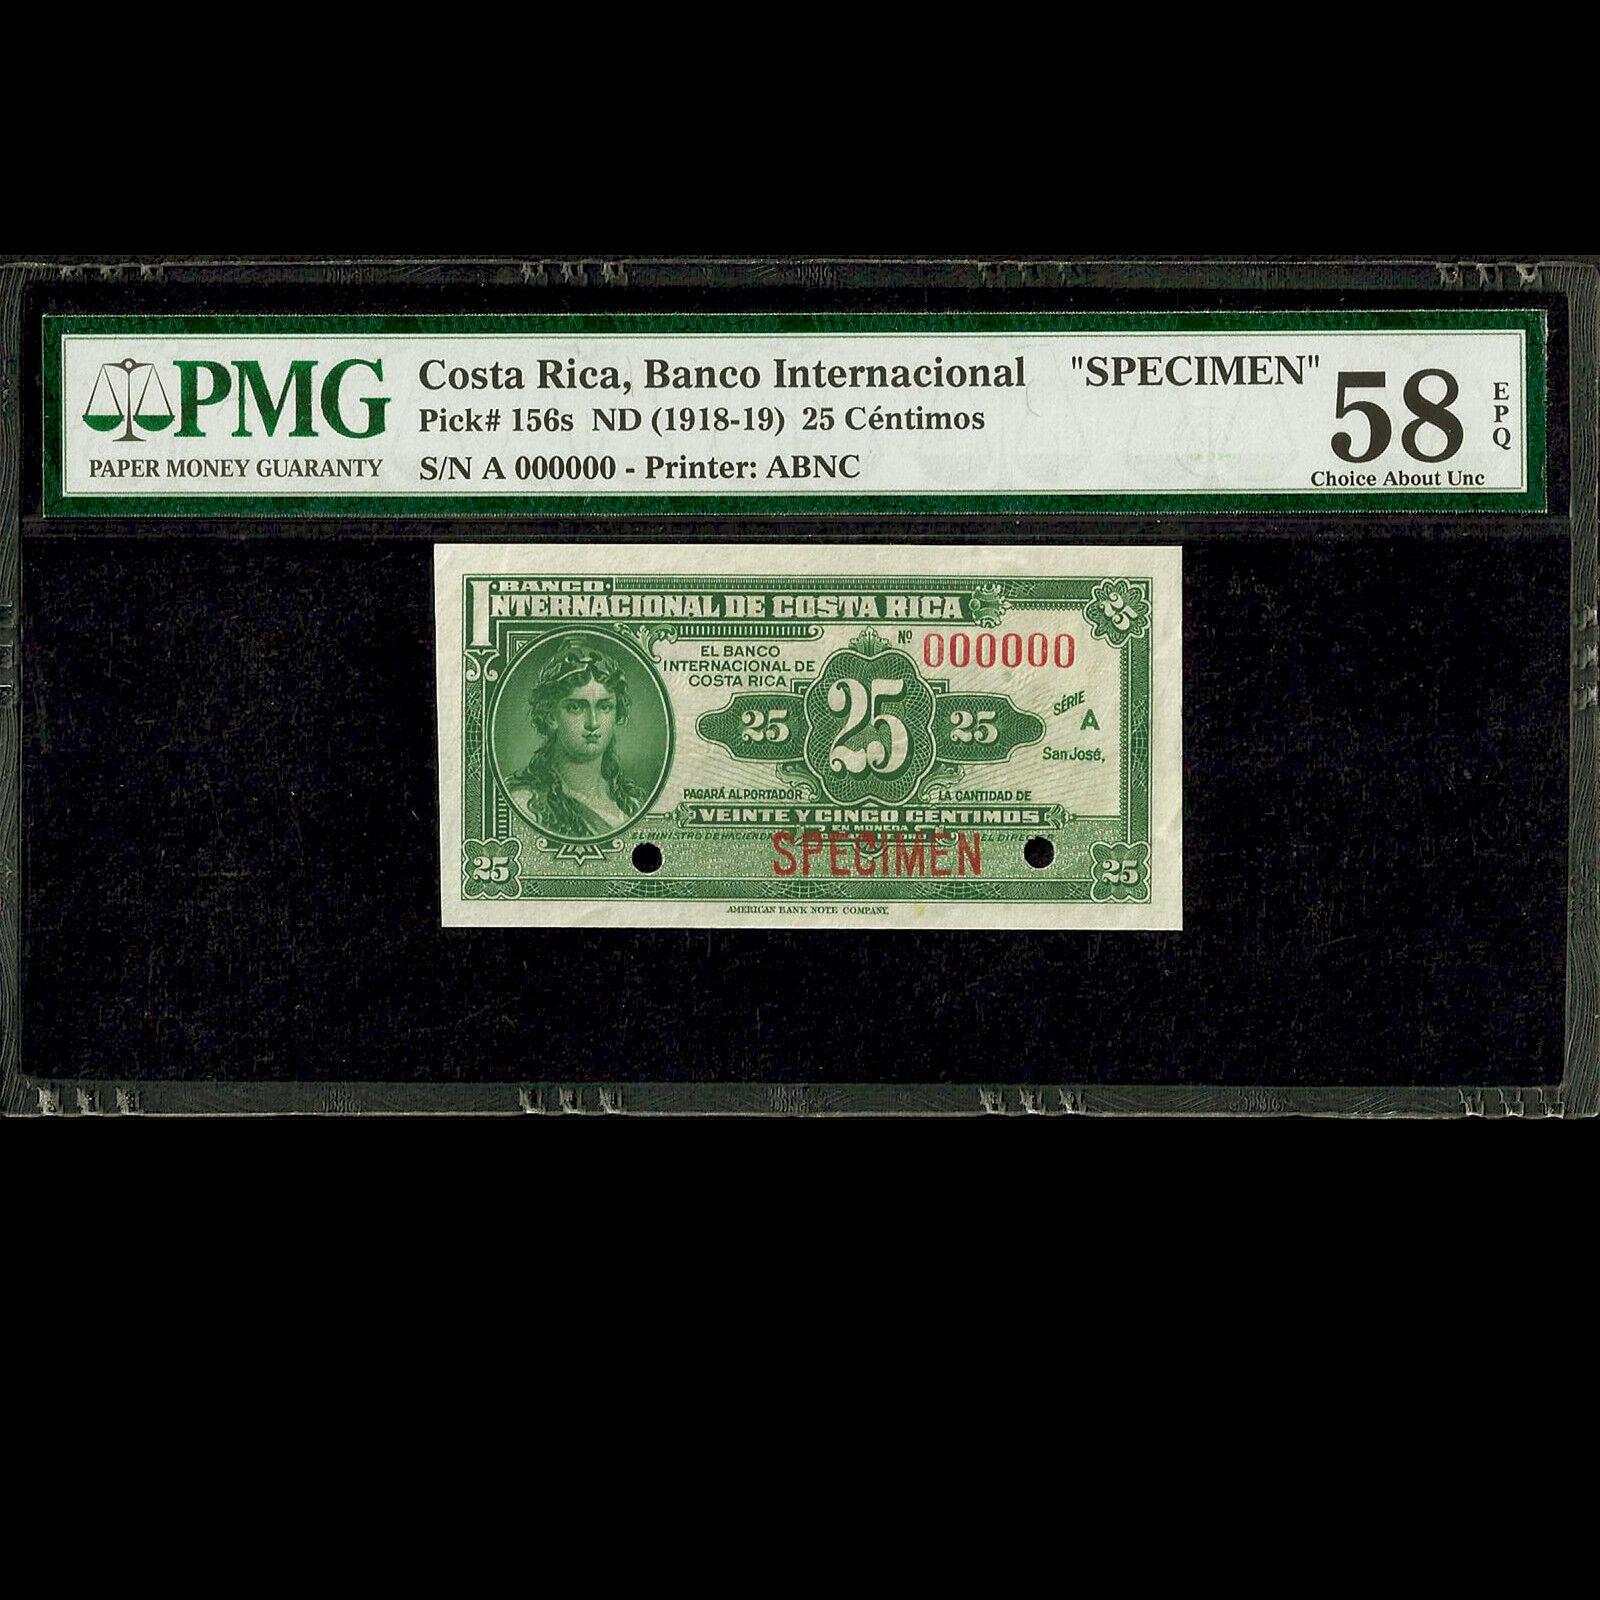 Costa Rica 25 Centimos ND (1918-19) Specimen PMG 58 Choice About UNC EPQ P-156s